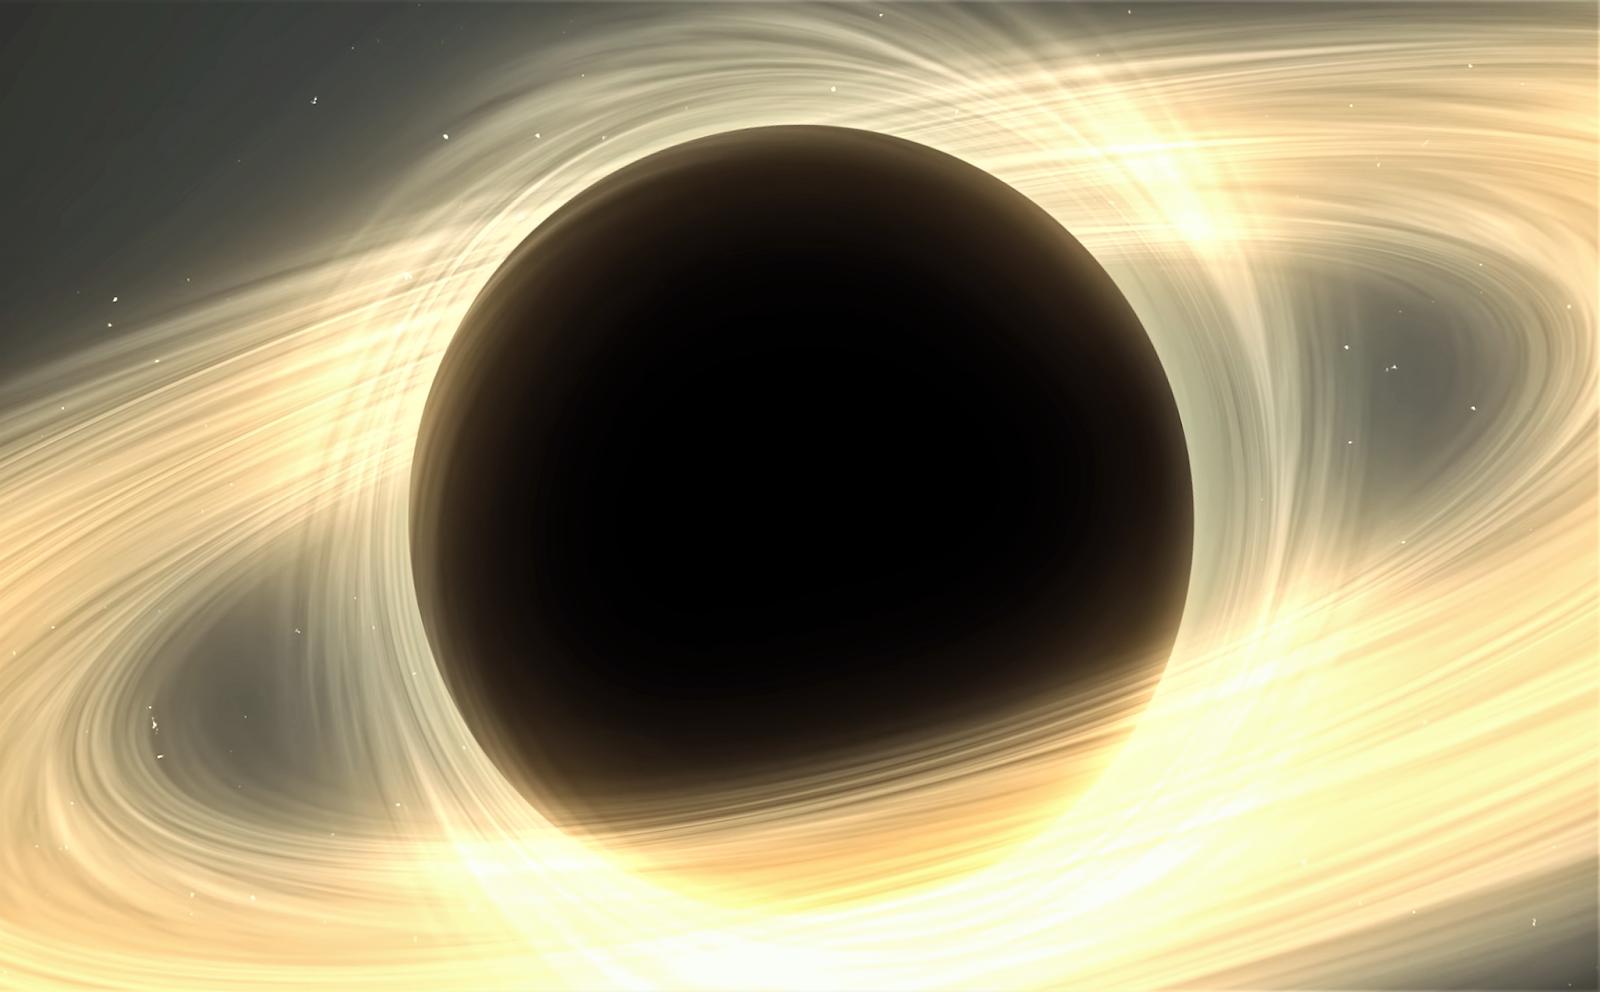 galaxy with three supermassive black holes